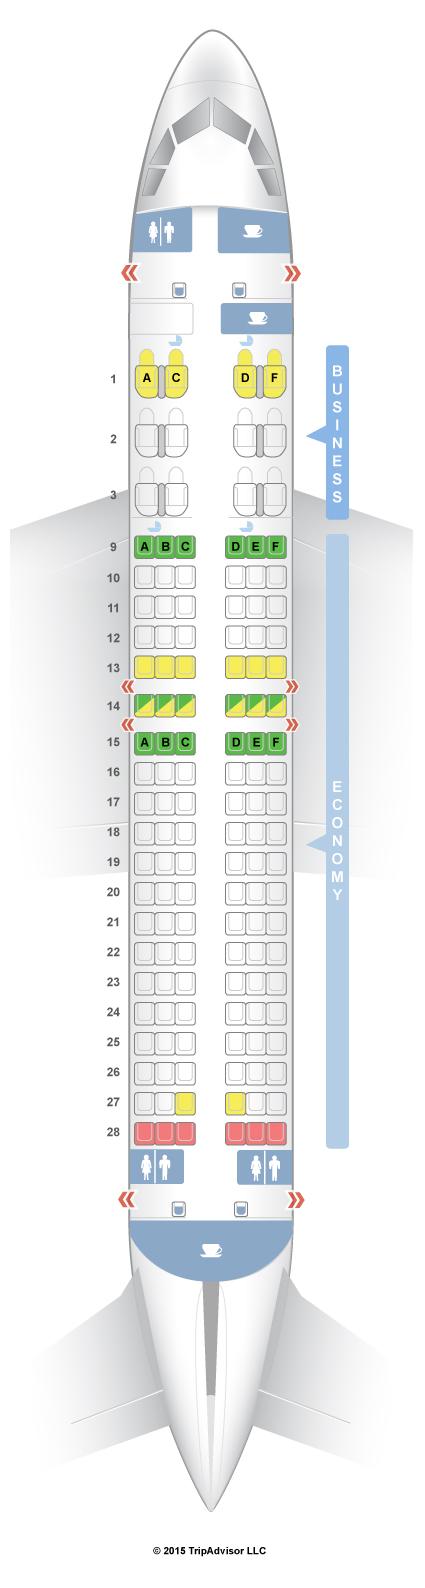 Seatguru Seat Map Qatar Airways Airbus A320 320 V2 Seatguru